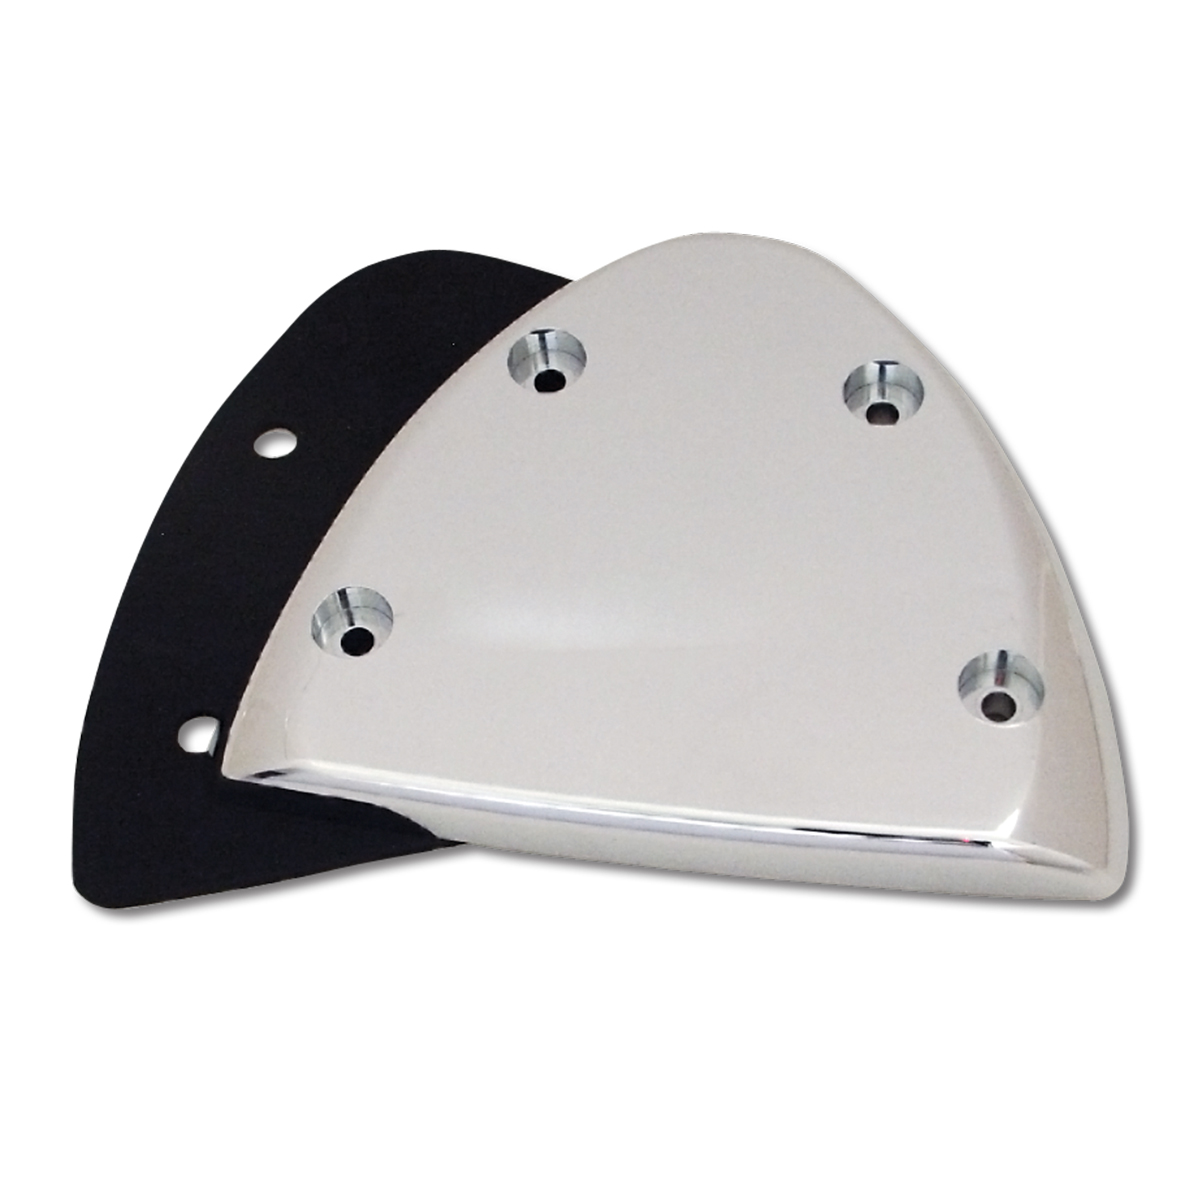 Headlight Blinker Cover for Pete Single & Dual Headlights